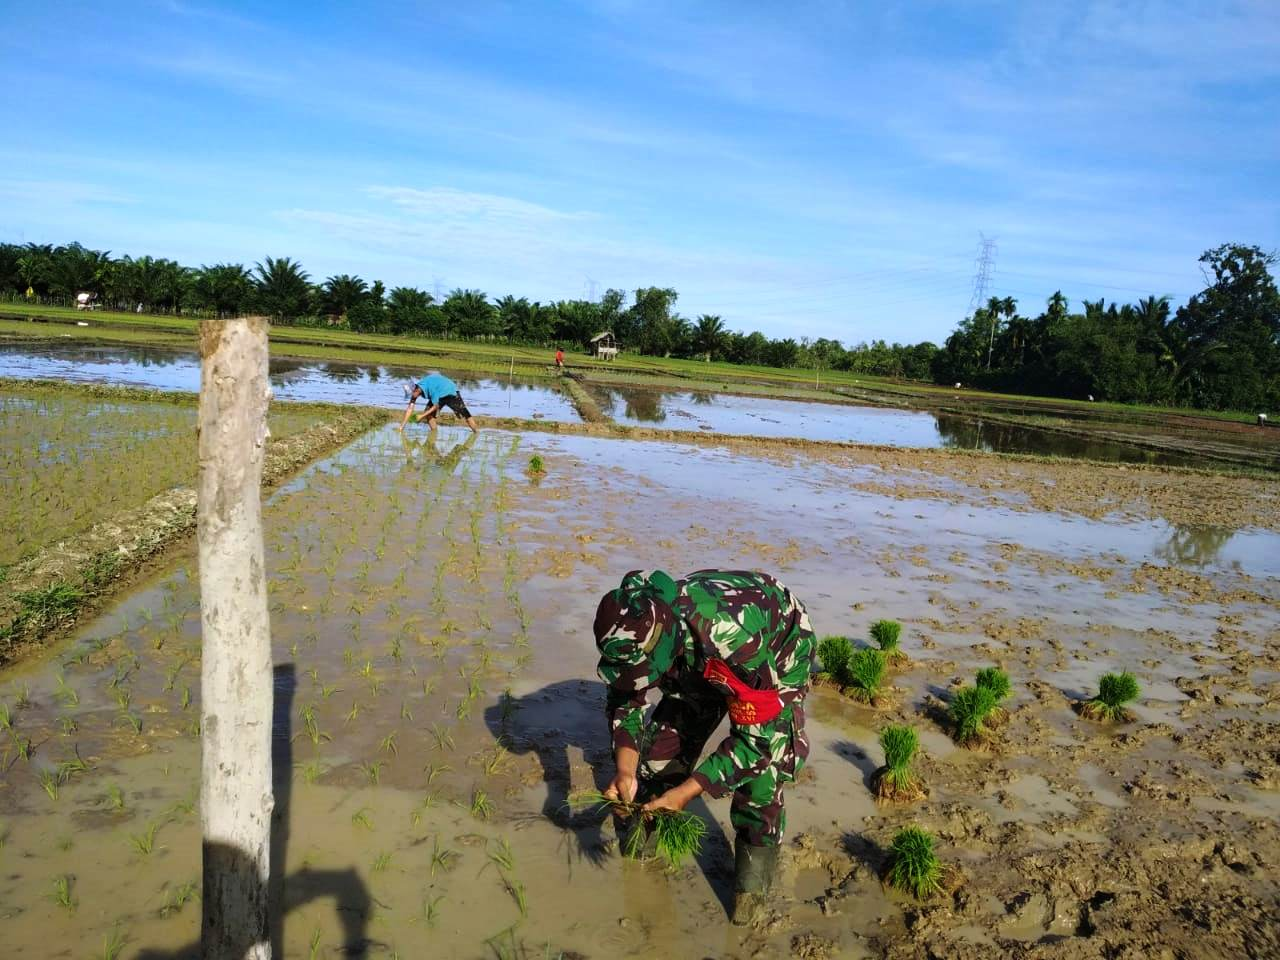 Meski Dalam Kondisi Puasa, Serda Taufiq Nasution Tetap Membantu Warganya Tanam Padi/theeast.co.id